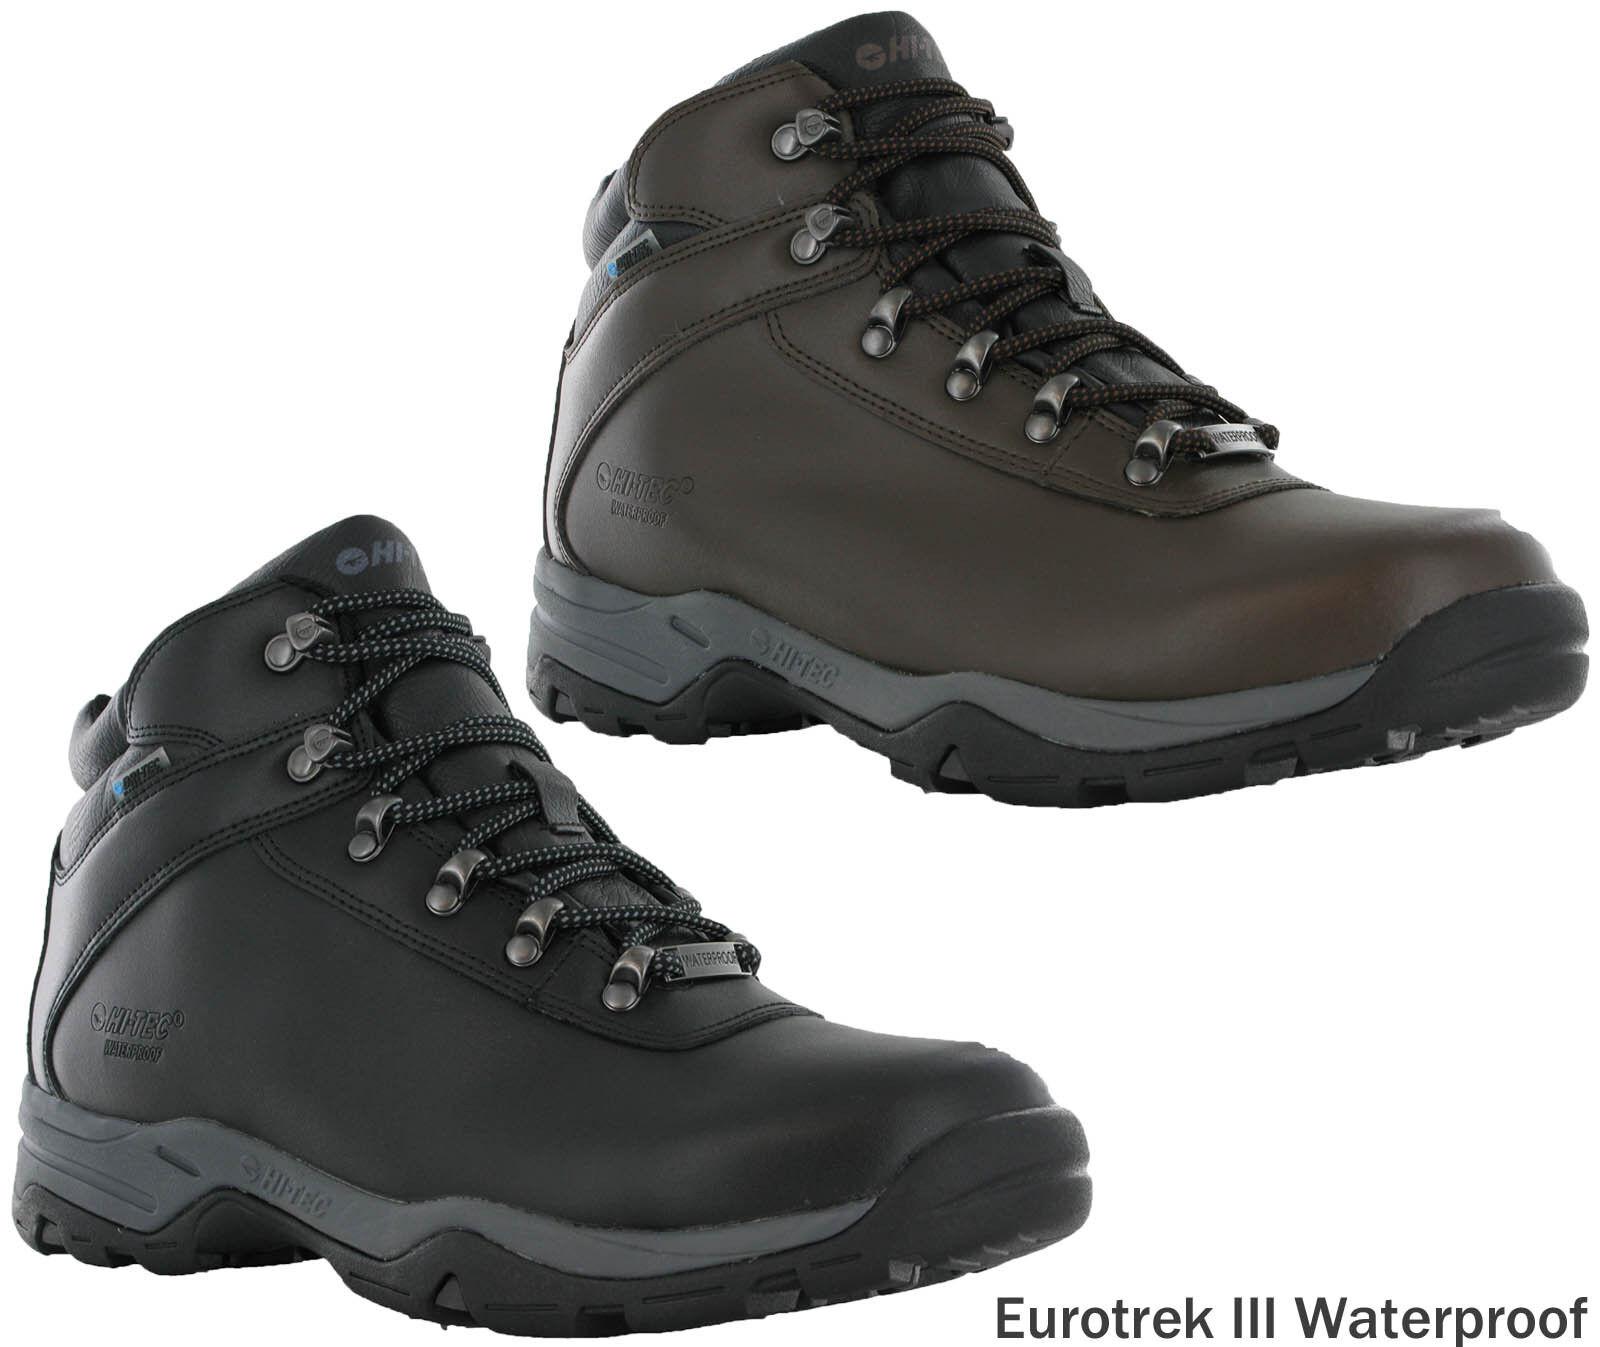 Hi-Tec Eurotrek III Leather Walking Hiking Trail Waterproof Outdoor Boots Mens